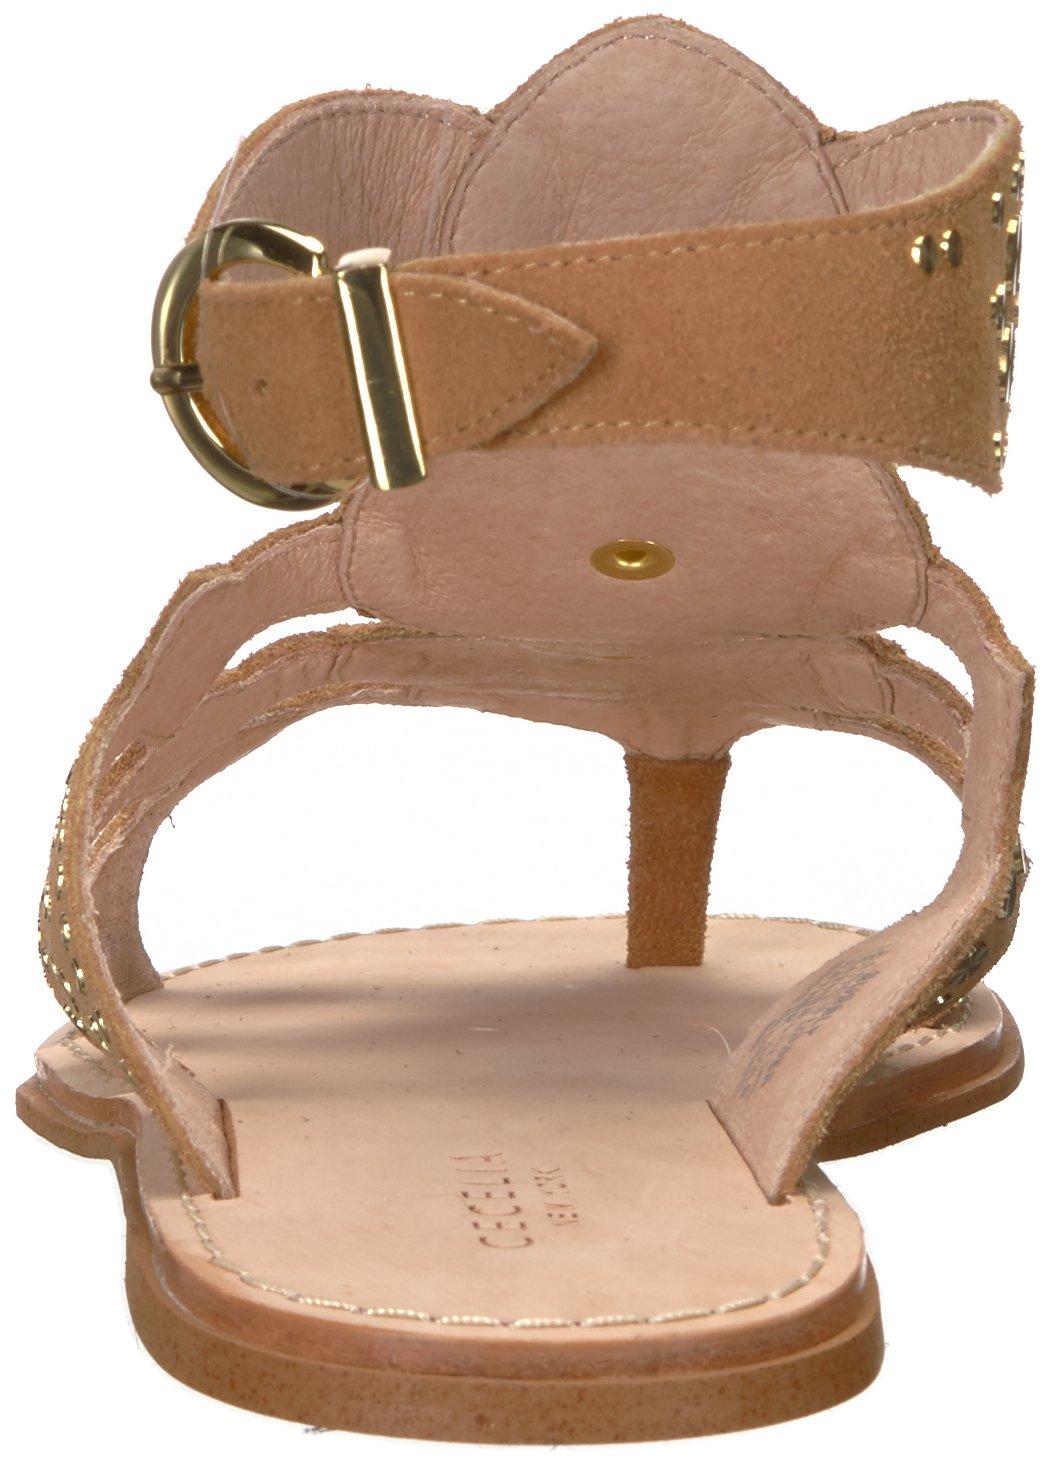 Cecelia New B078FHF659 York Women's Bubbly Slide Sandal B078FHF659 New 7.5 B(M) US Sand 992db8